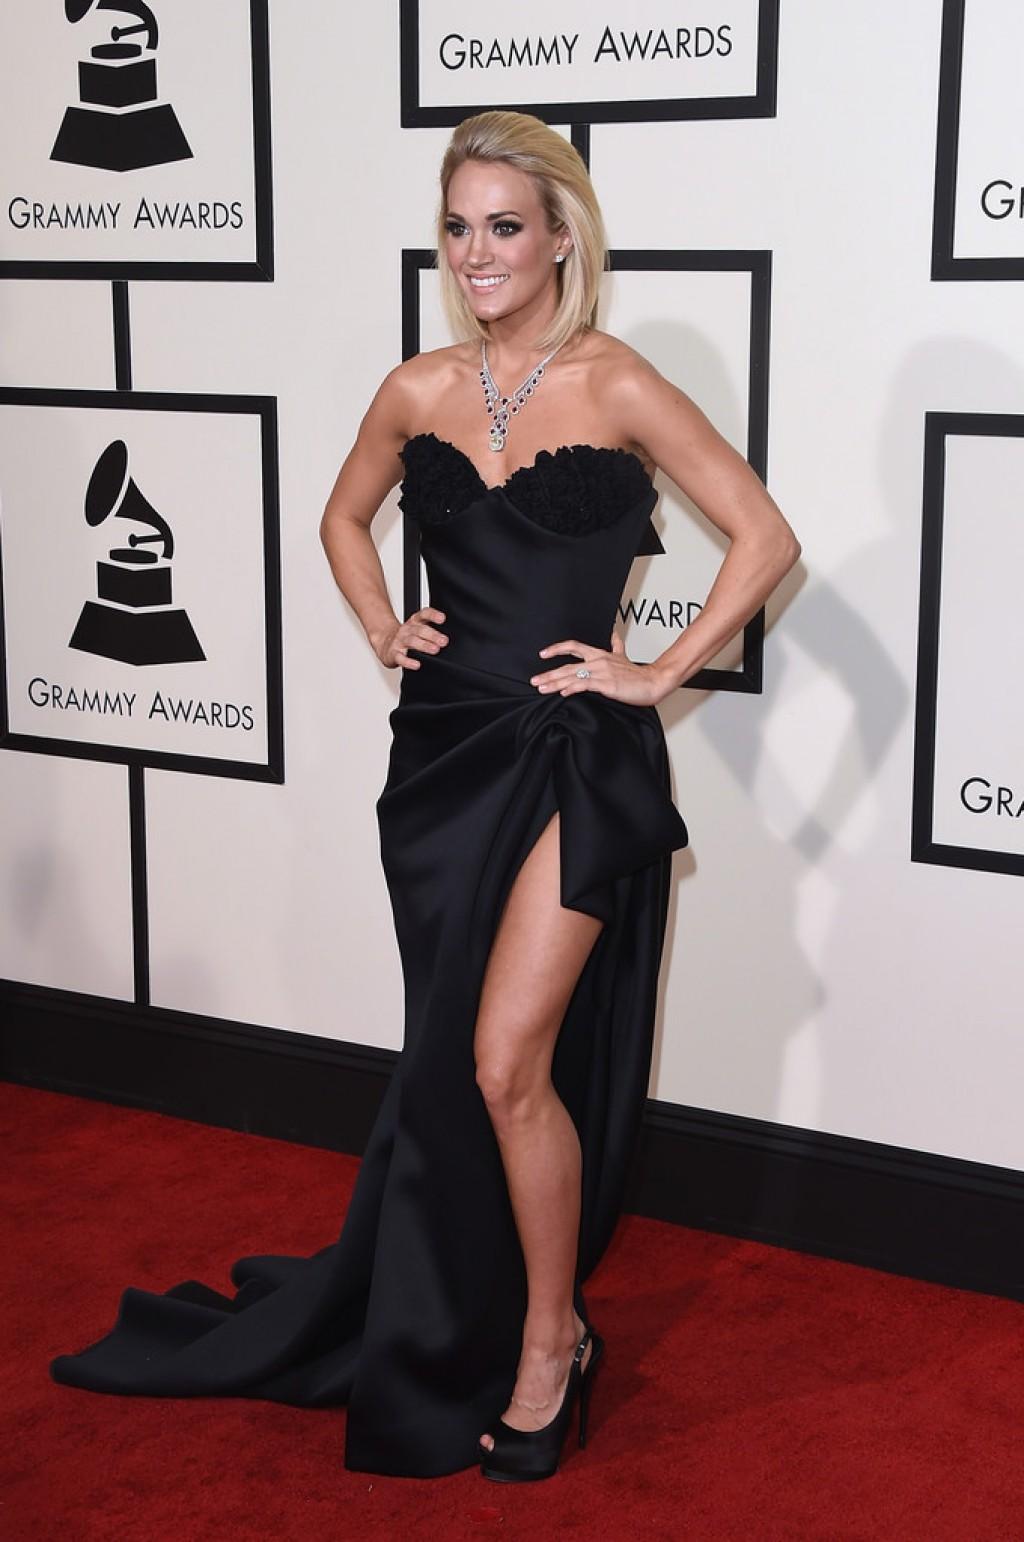 Carrie-Underwood-Wearing-Nicolas-Jebran-2016-Grammys-1024x1542